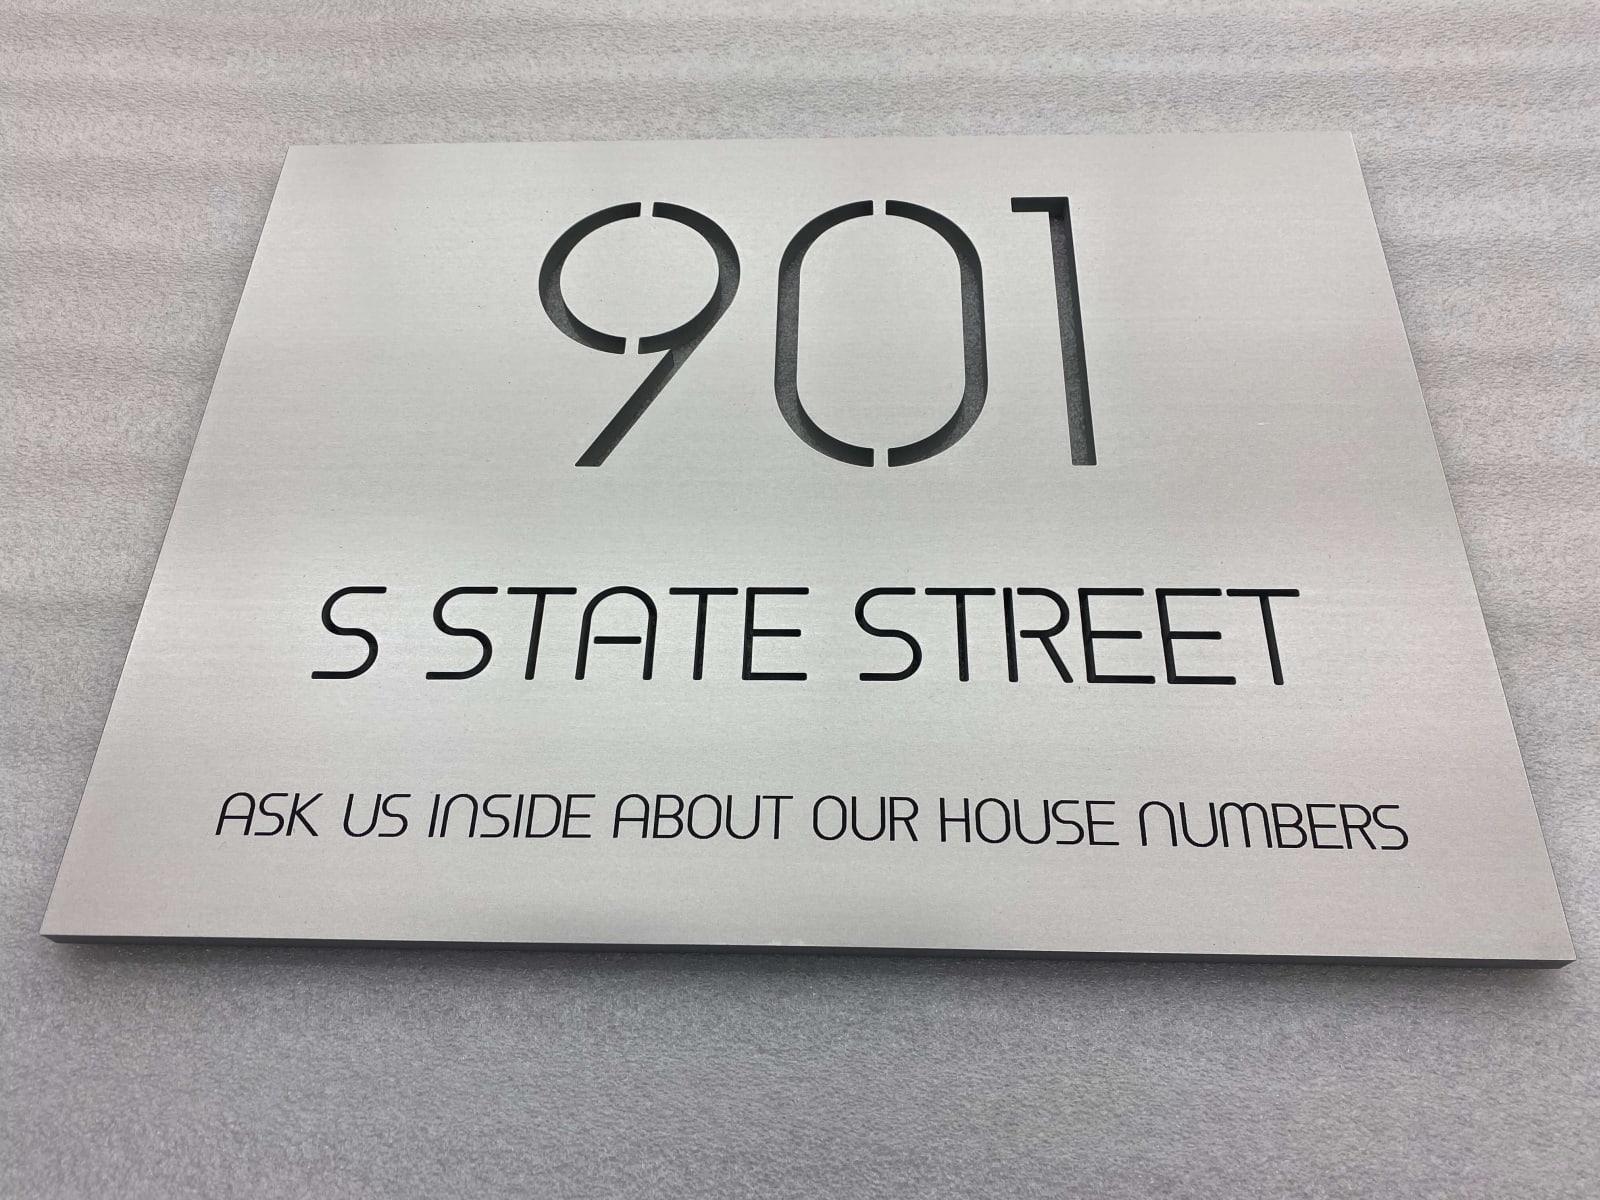 Vivid House Number | Custom Residential Address Signs | 901 S State Street | Aluminum Finish